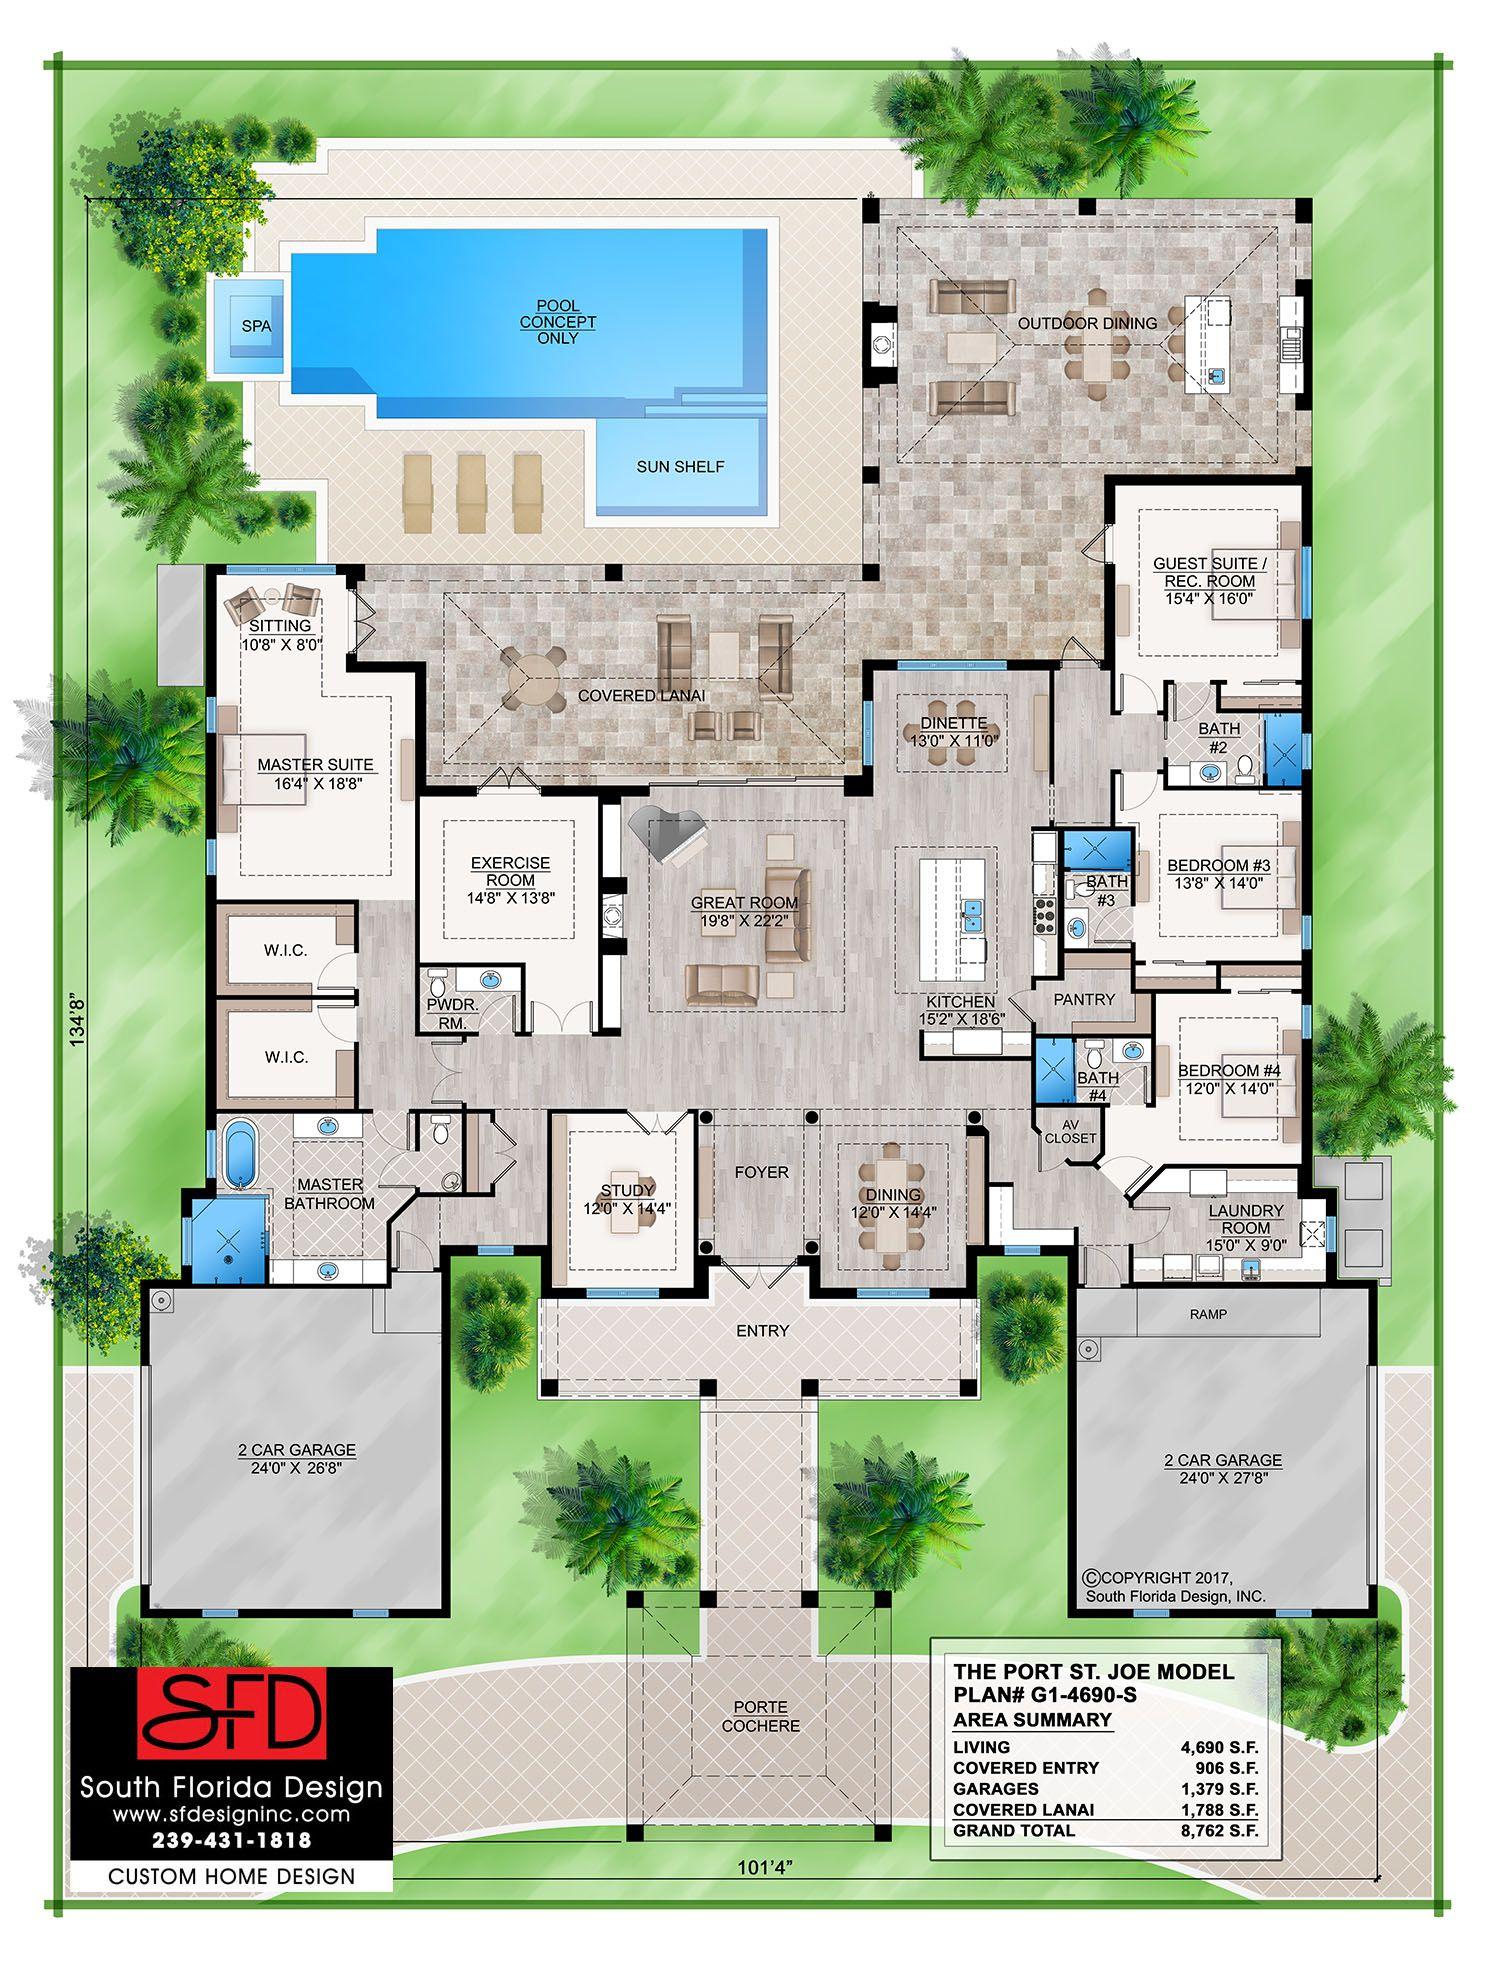 g1 4690 s_port st joe_21117_color plan low res_logo dream house plansmy - My Dream House Plan